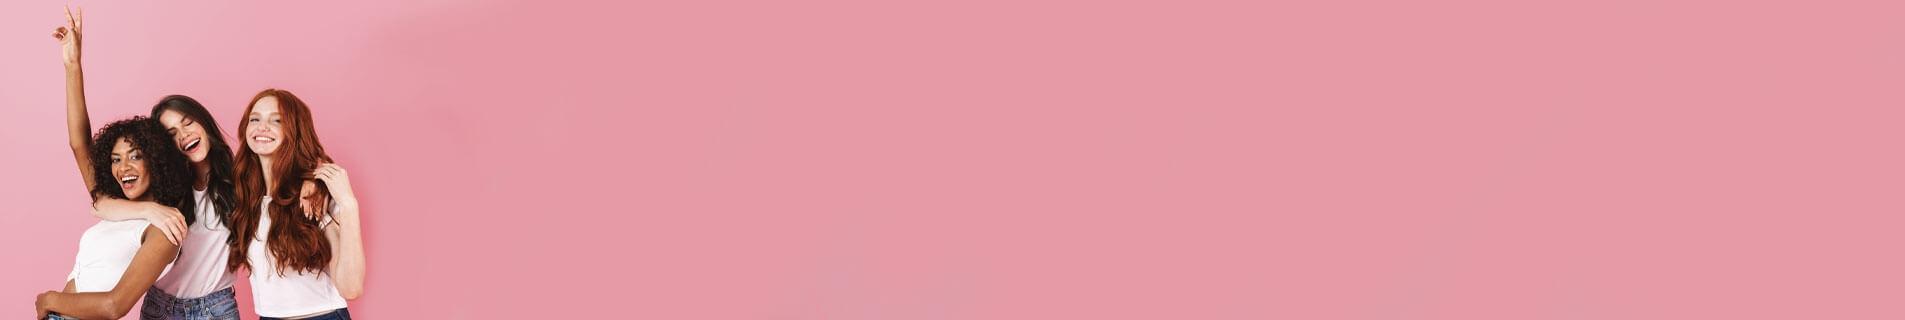 Ventes privées parfum | Parfum pas cher | SAGA Cosmetics